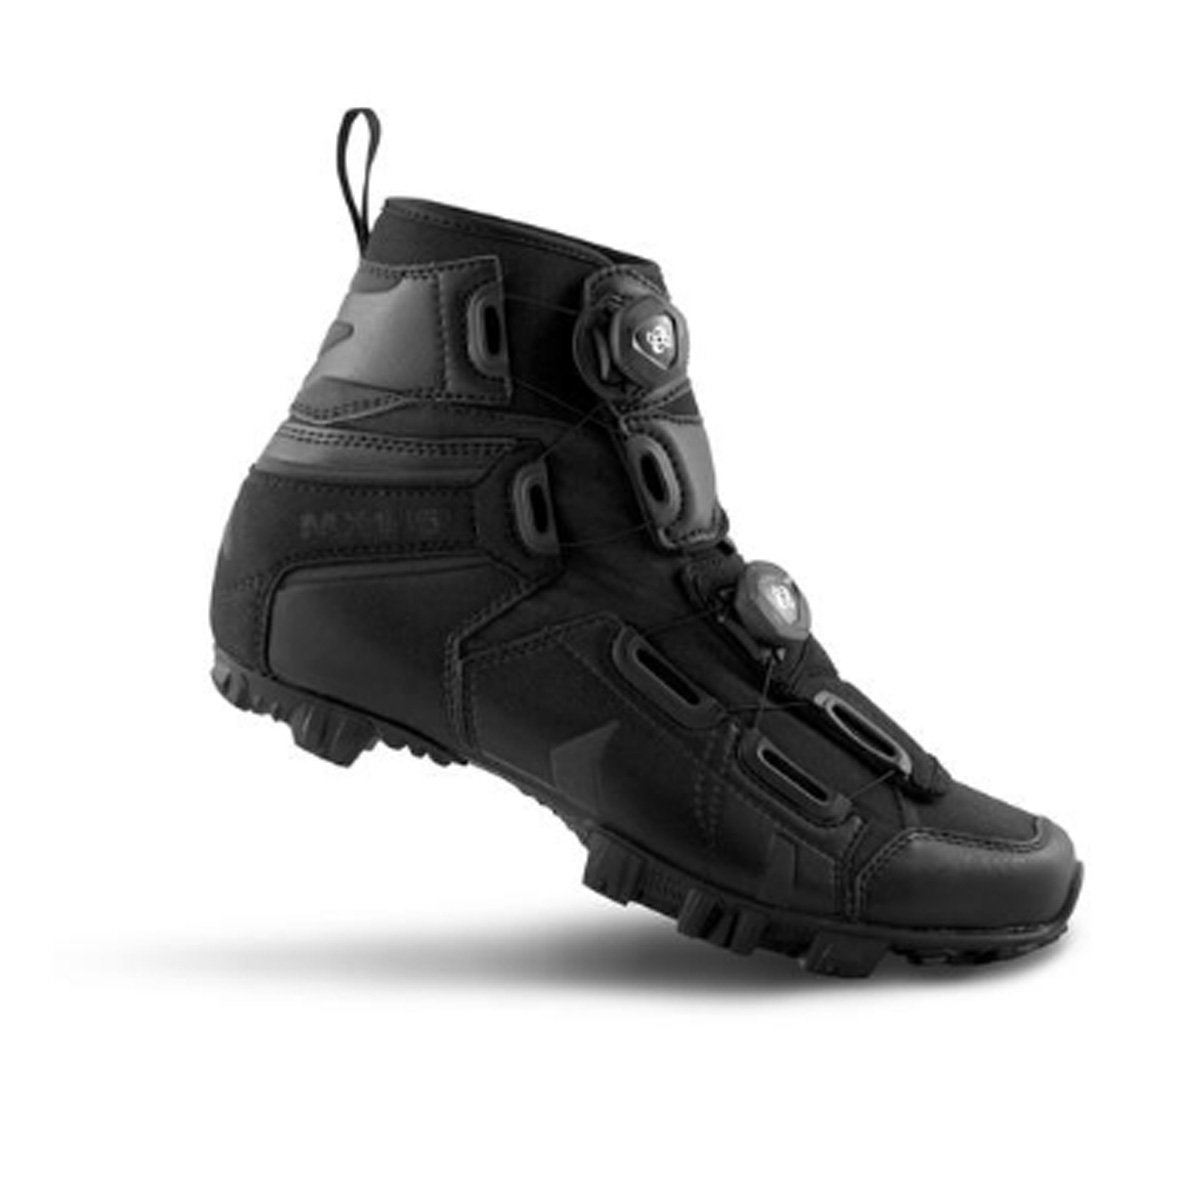 Lake MX145 Cycling Shoe Mens